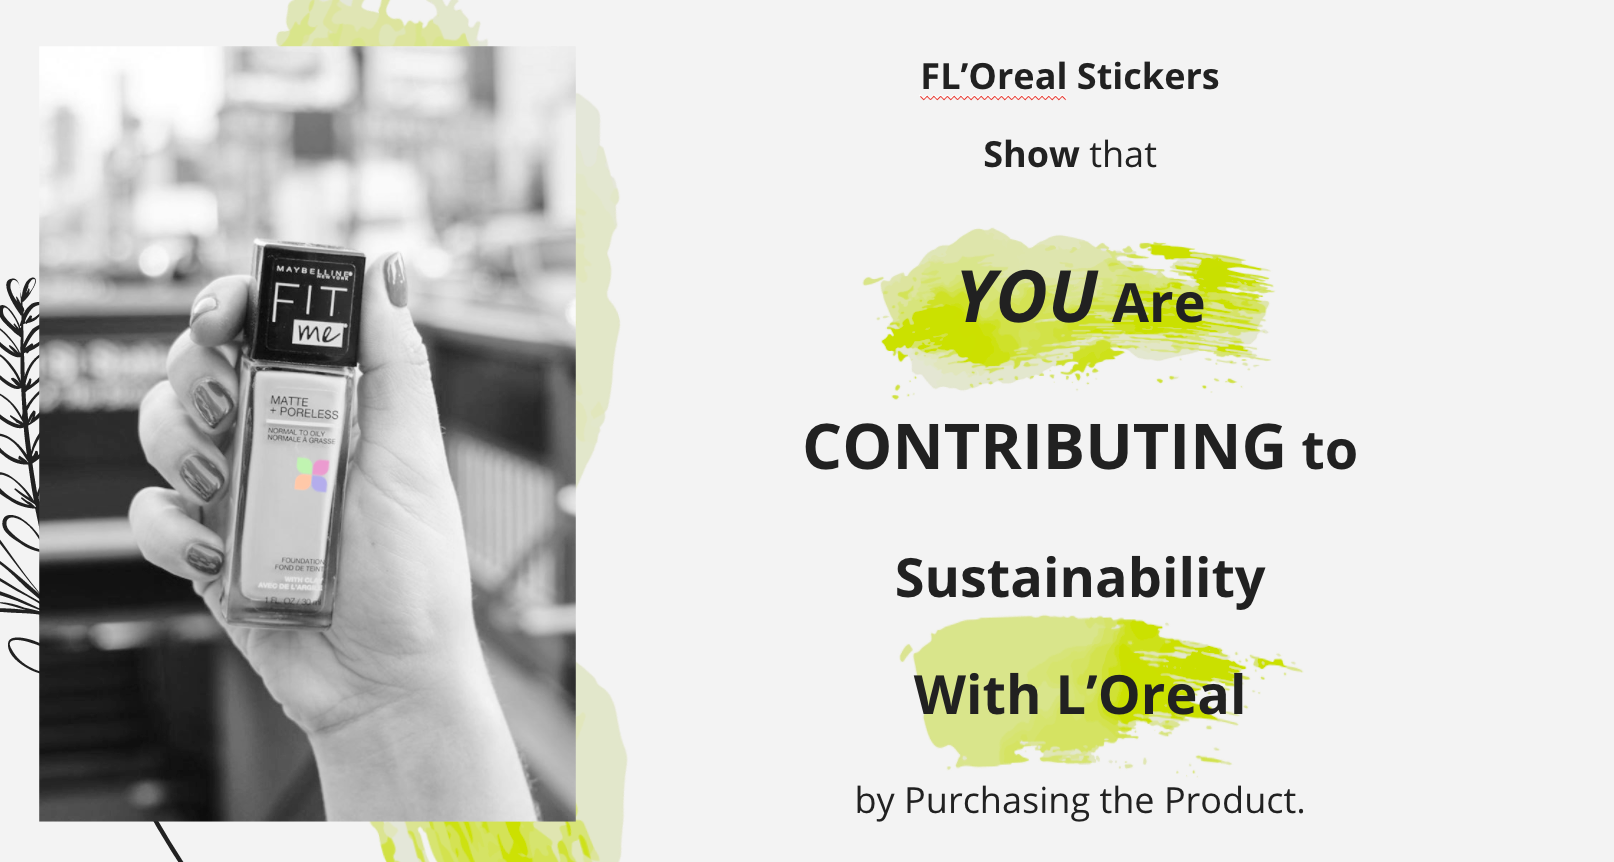 FL'Oreal Stickers